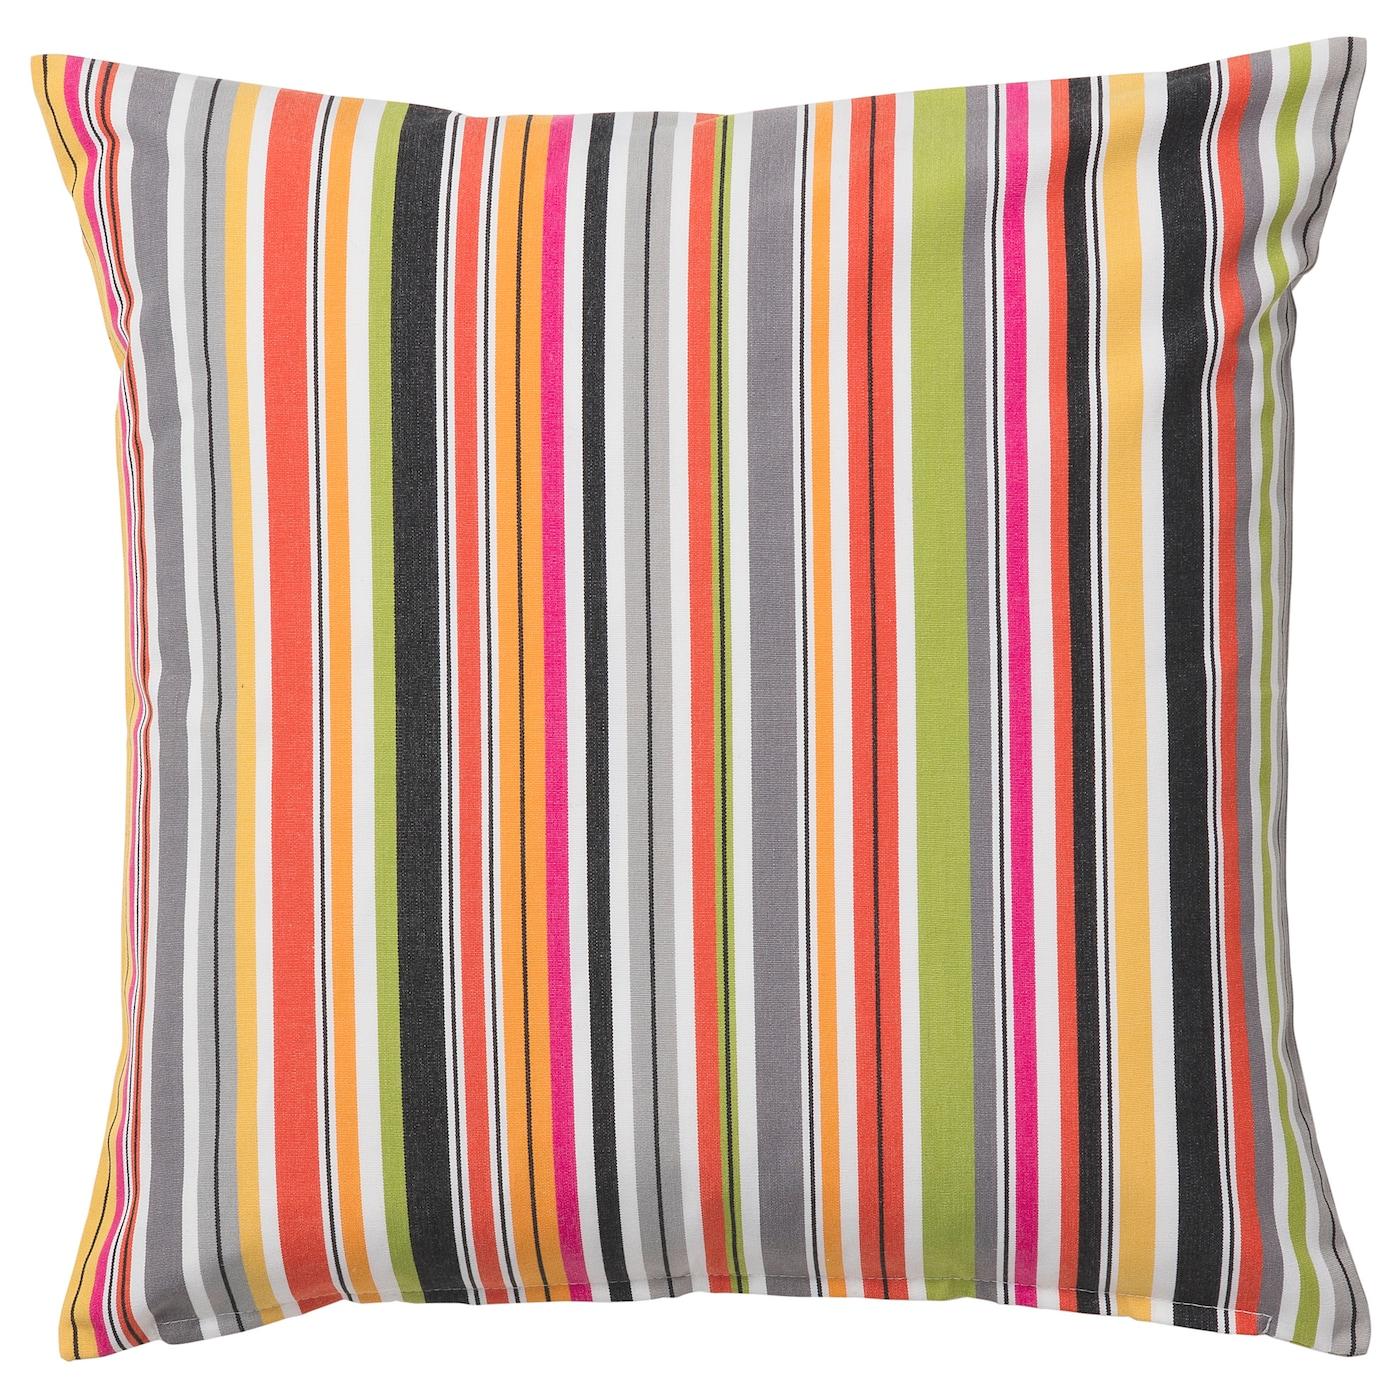 gurli cushion cover orange 50 x 50 cm ikea. Black Bedroom Furniture Sets. Home Design Ideas